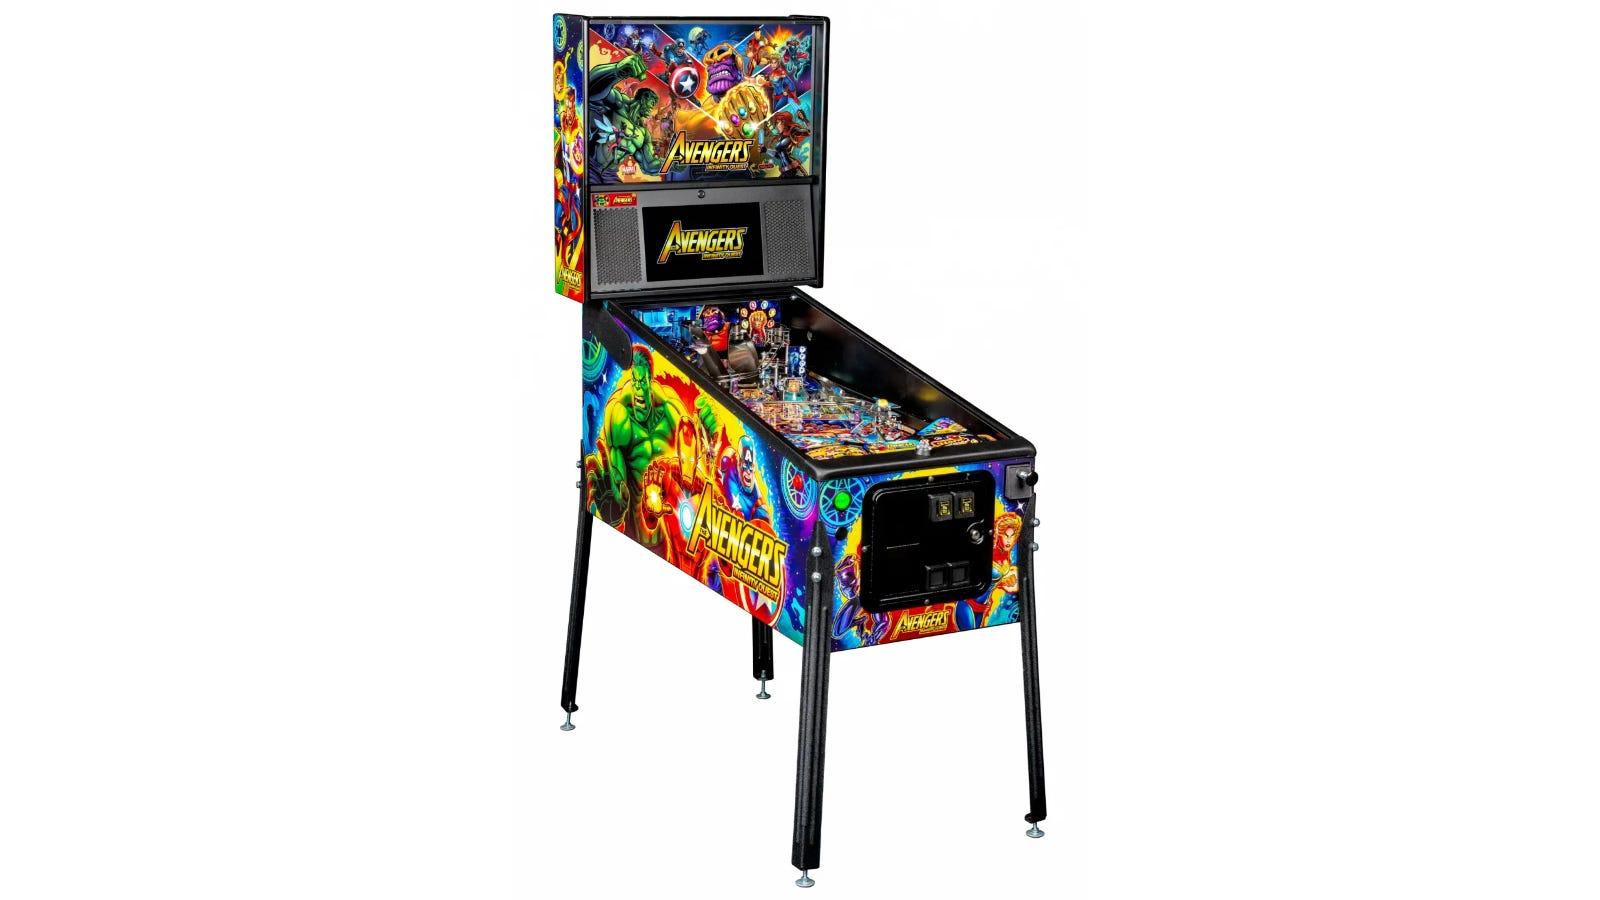 Avengers Infinity Quest Stern Pinball machine